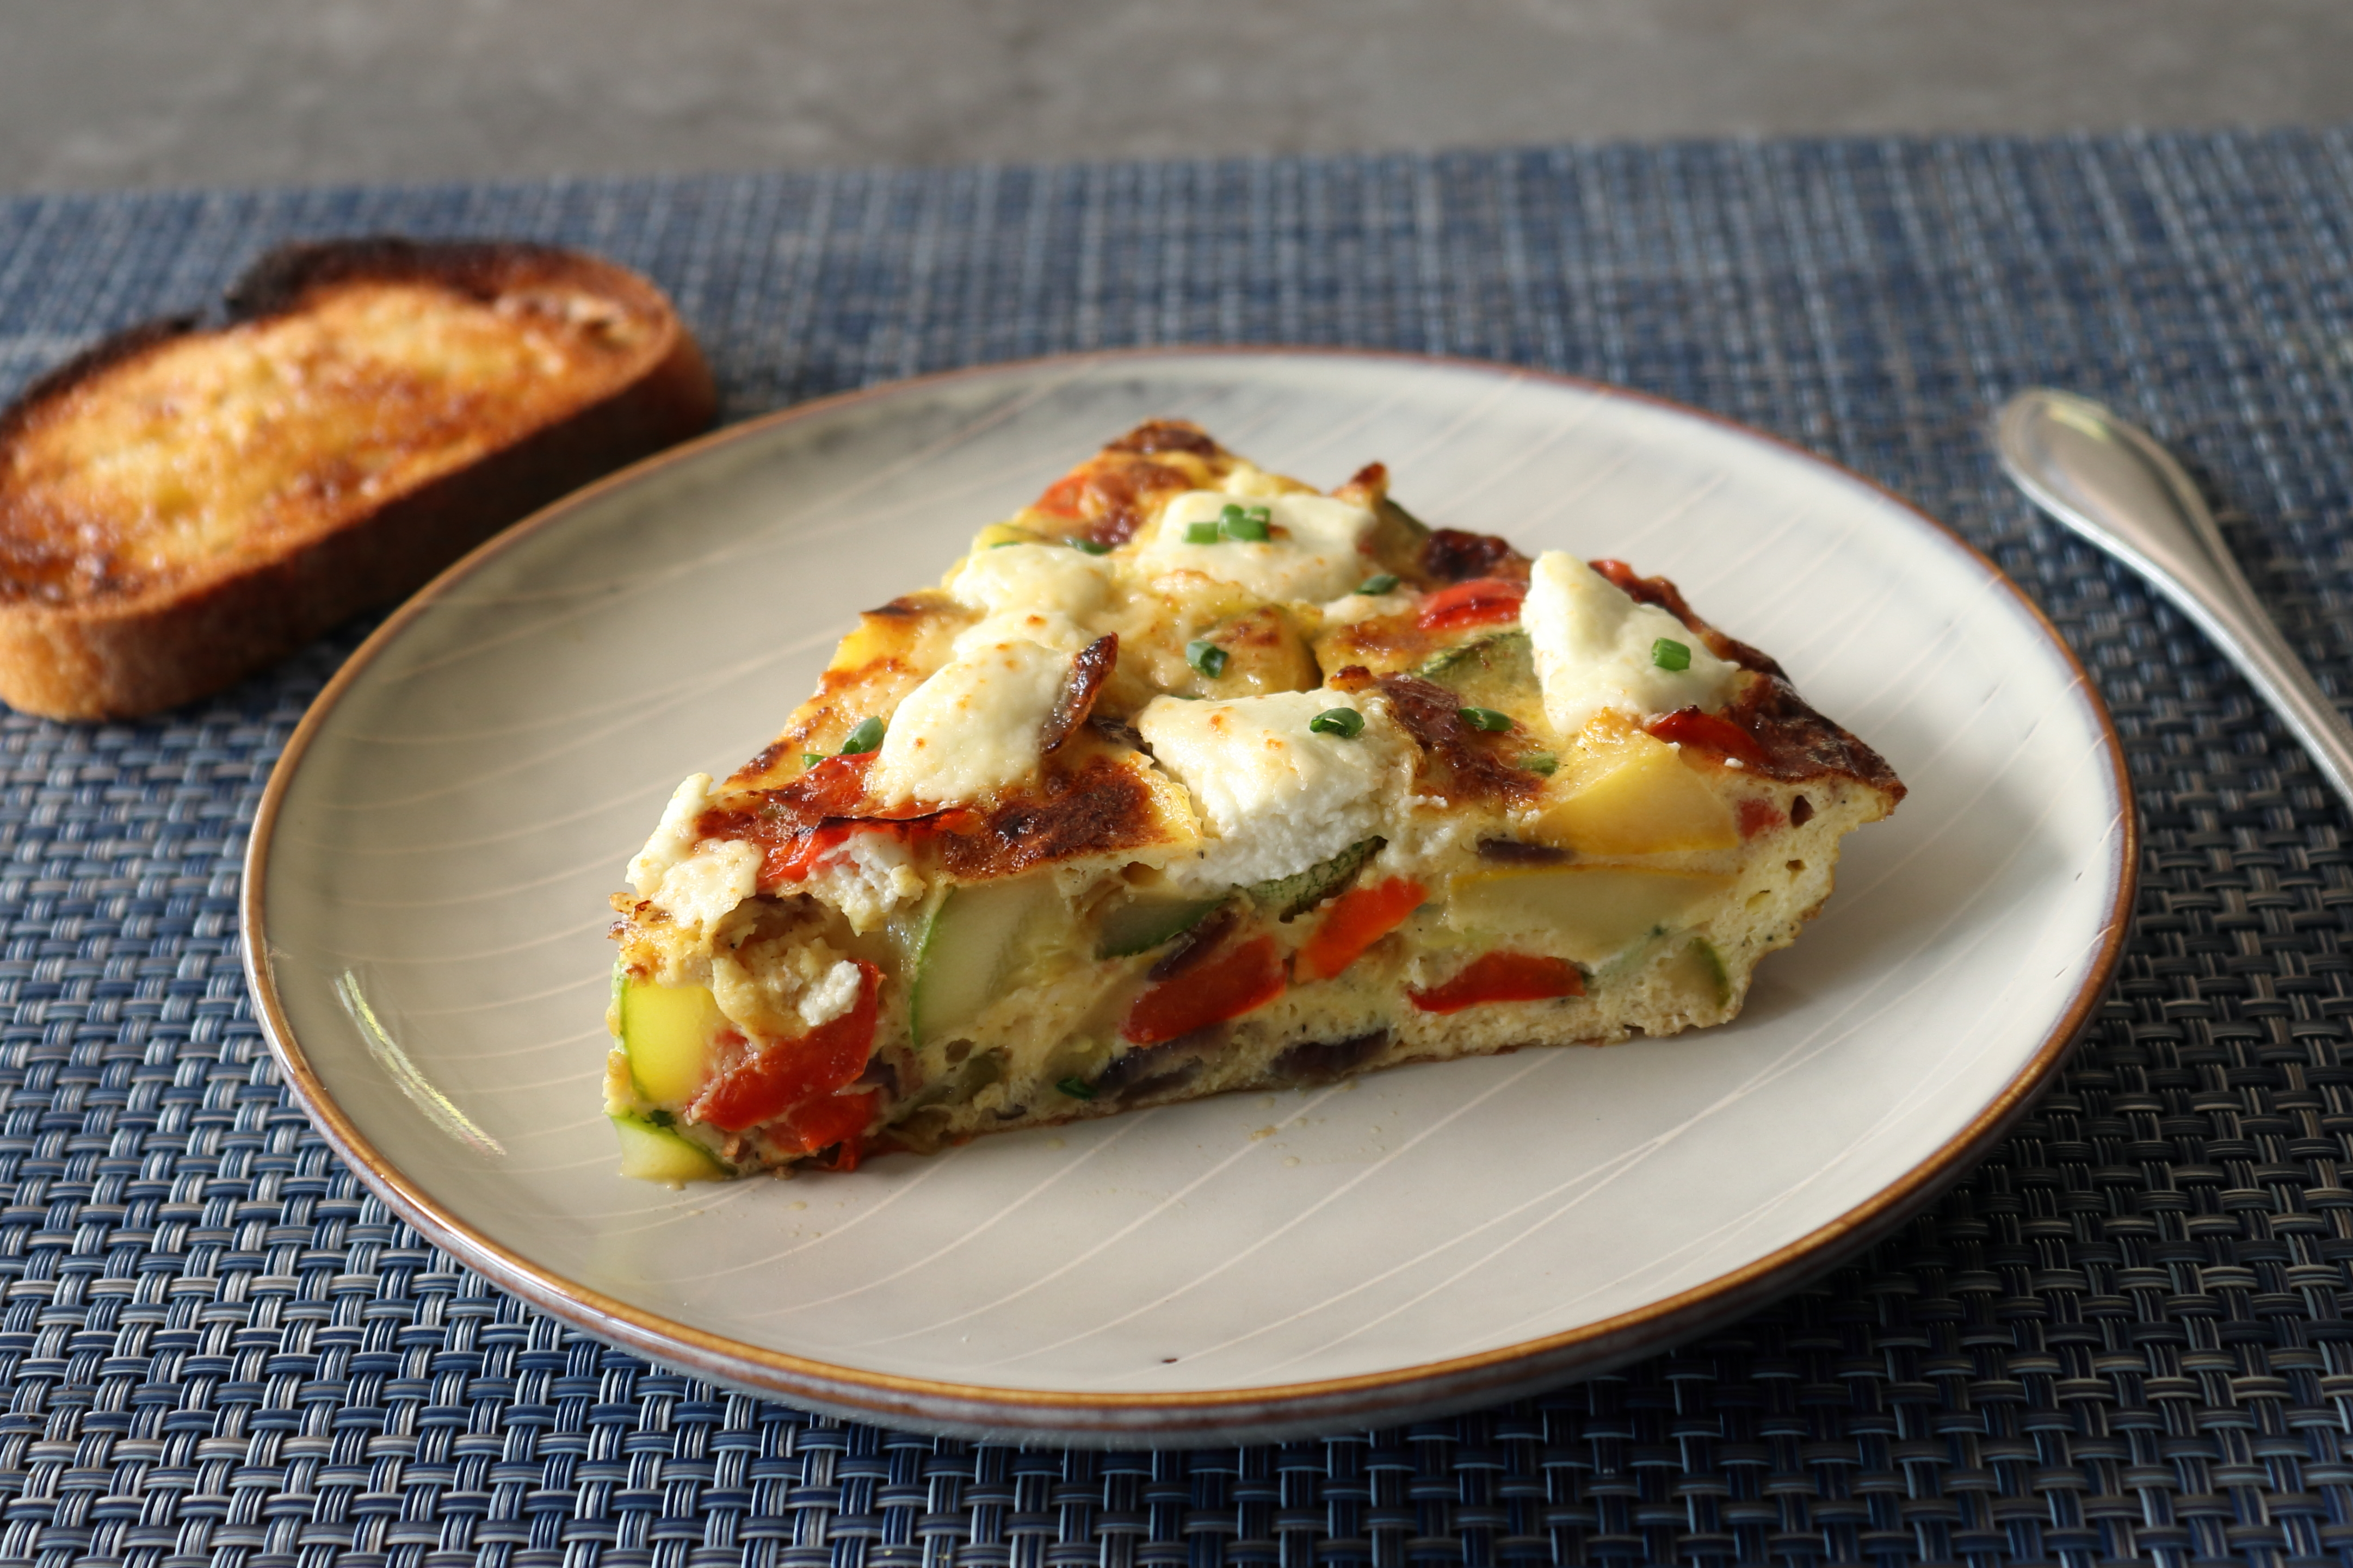 The Farmer's Frittata (Italian-Style Omelet) Chef John